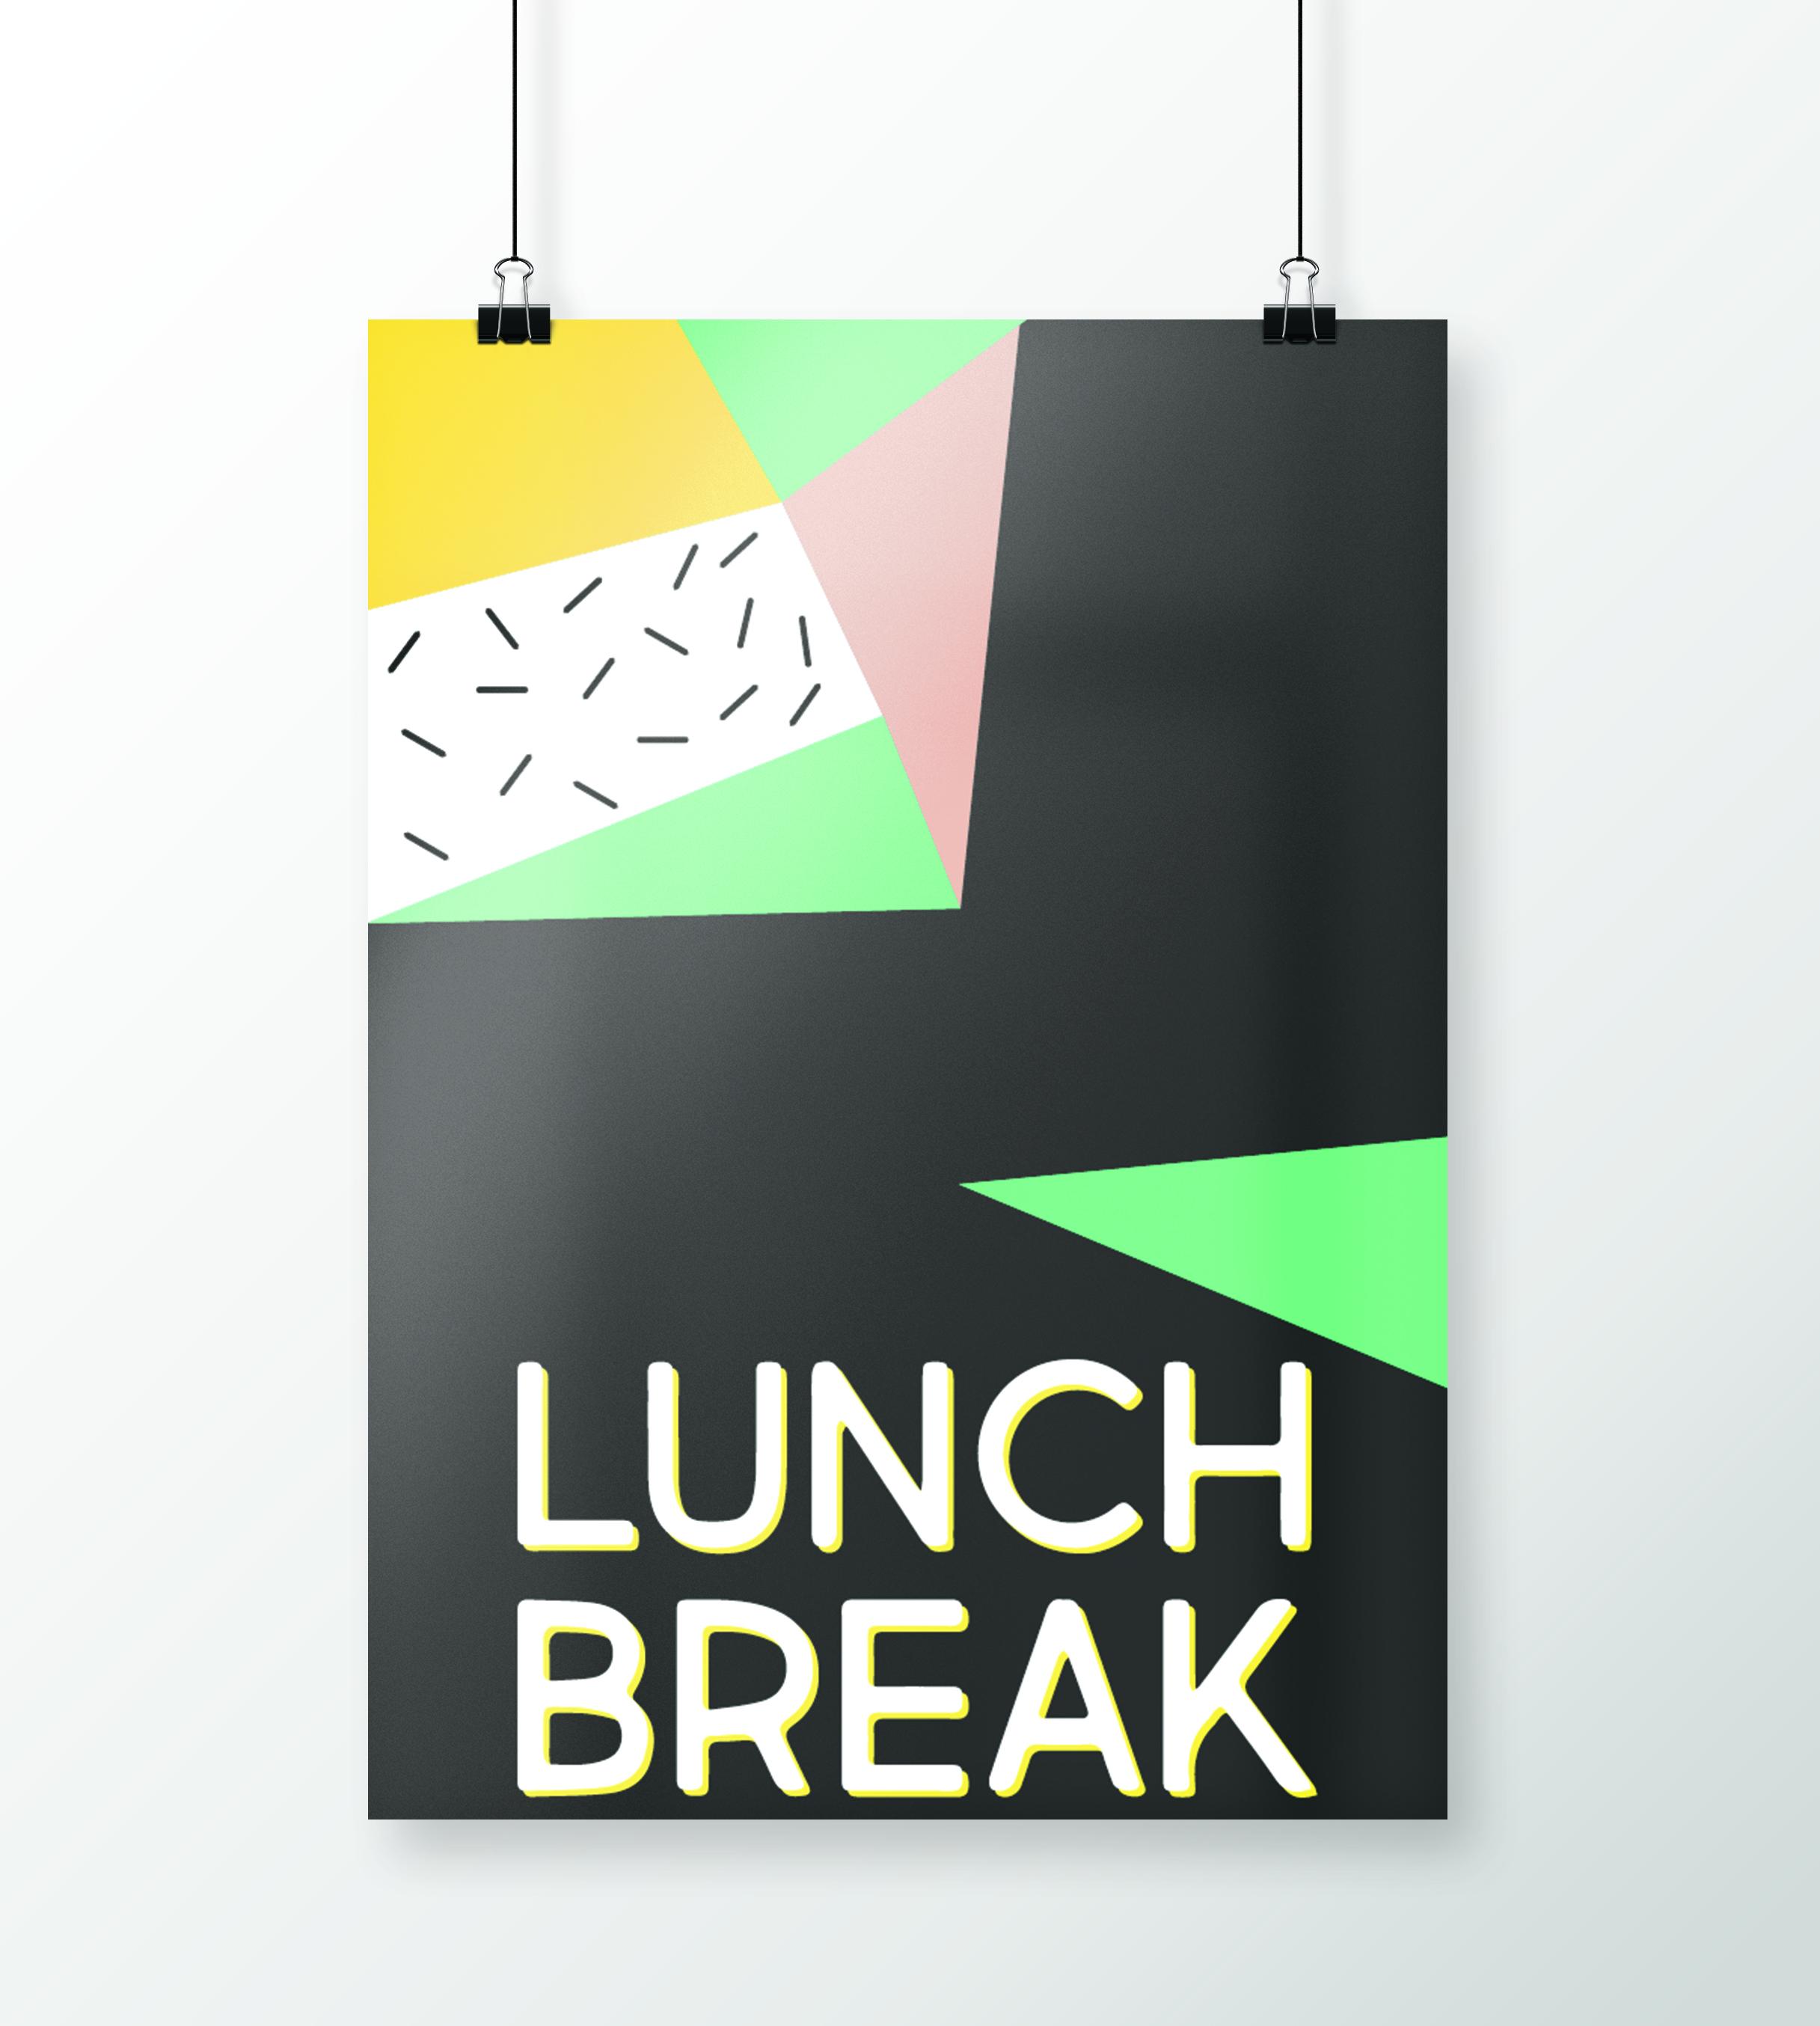 lunch break graphic.jpg